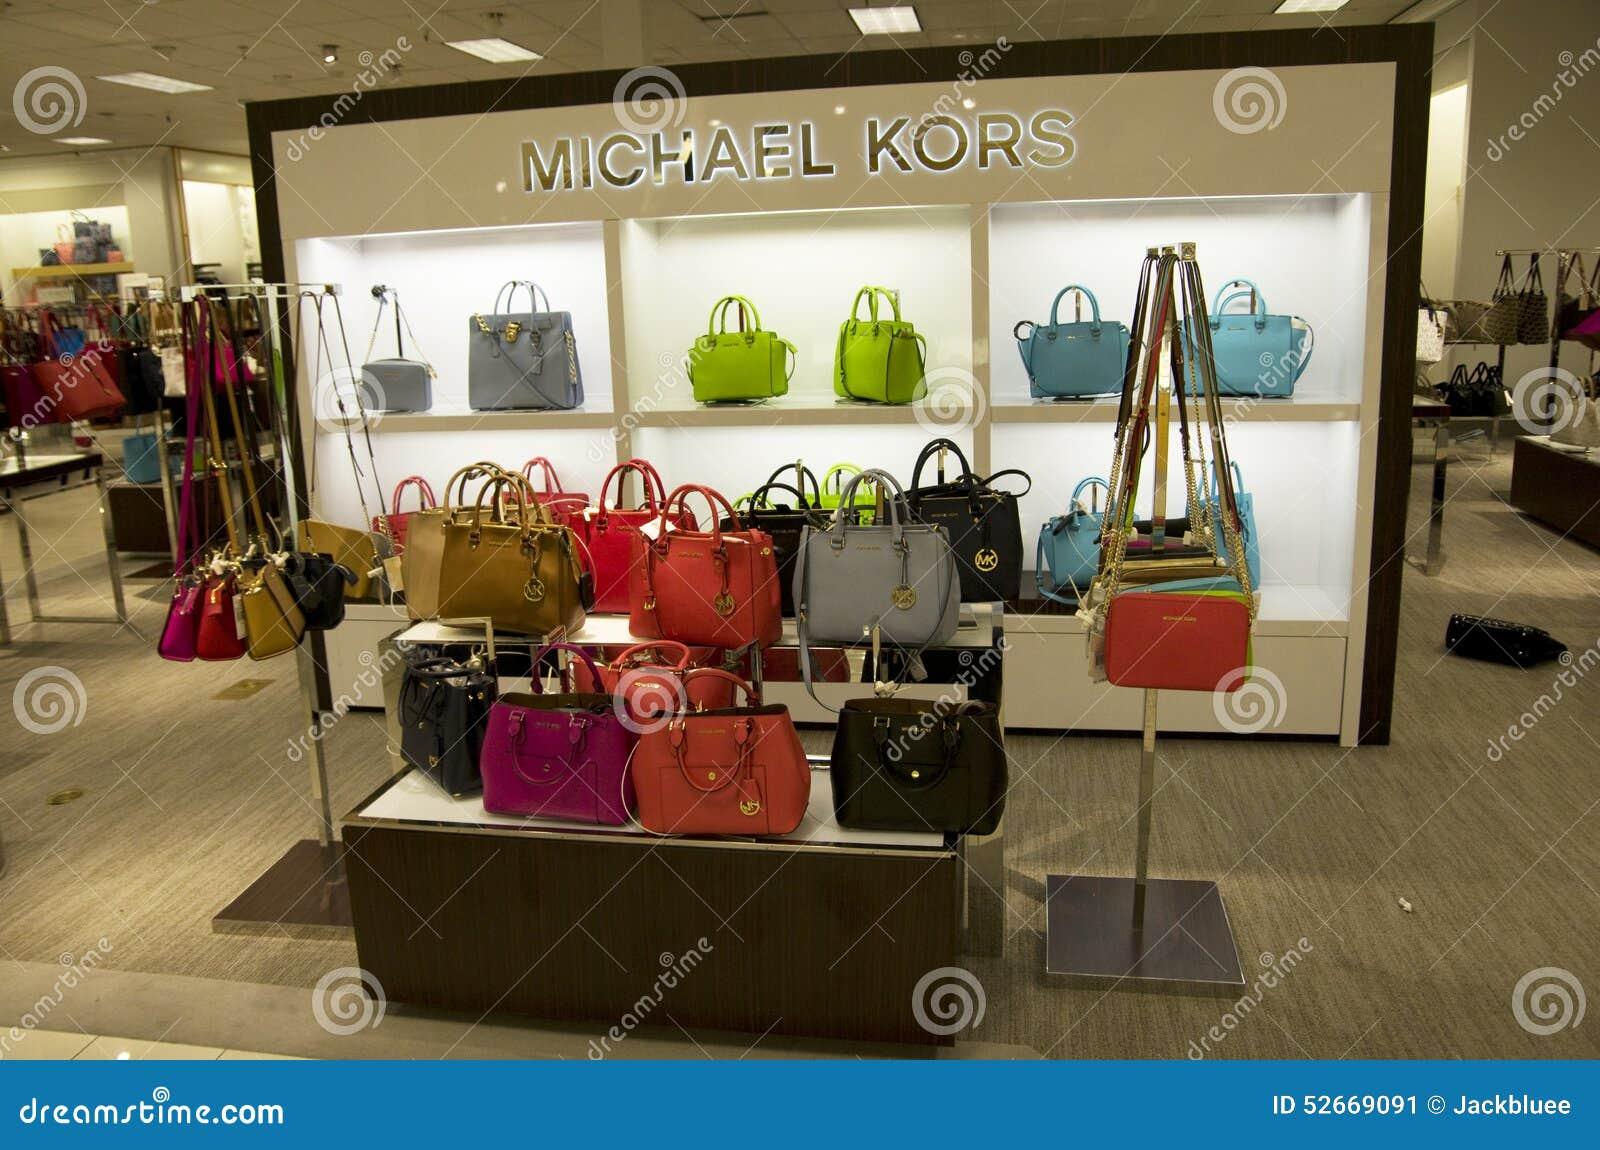 michael kors outlet purses j62d  Michael Kors Handbags Department Store Editorial Photo